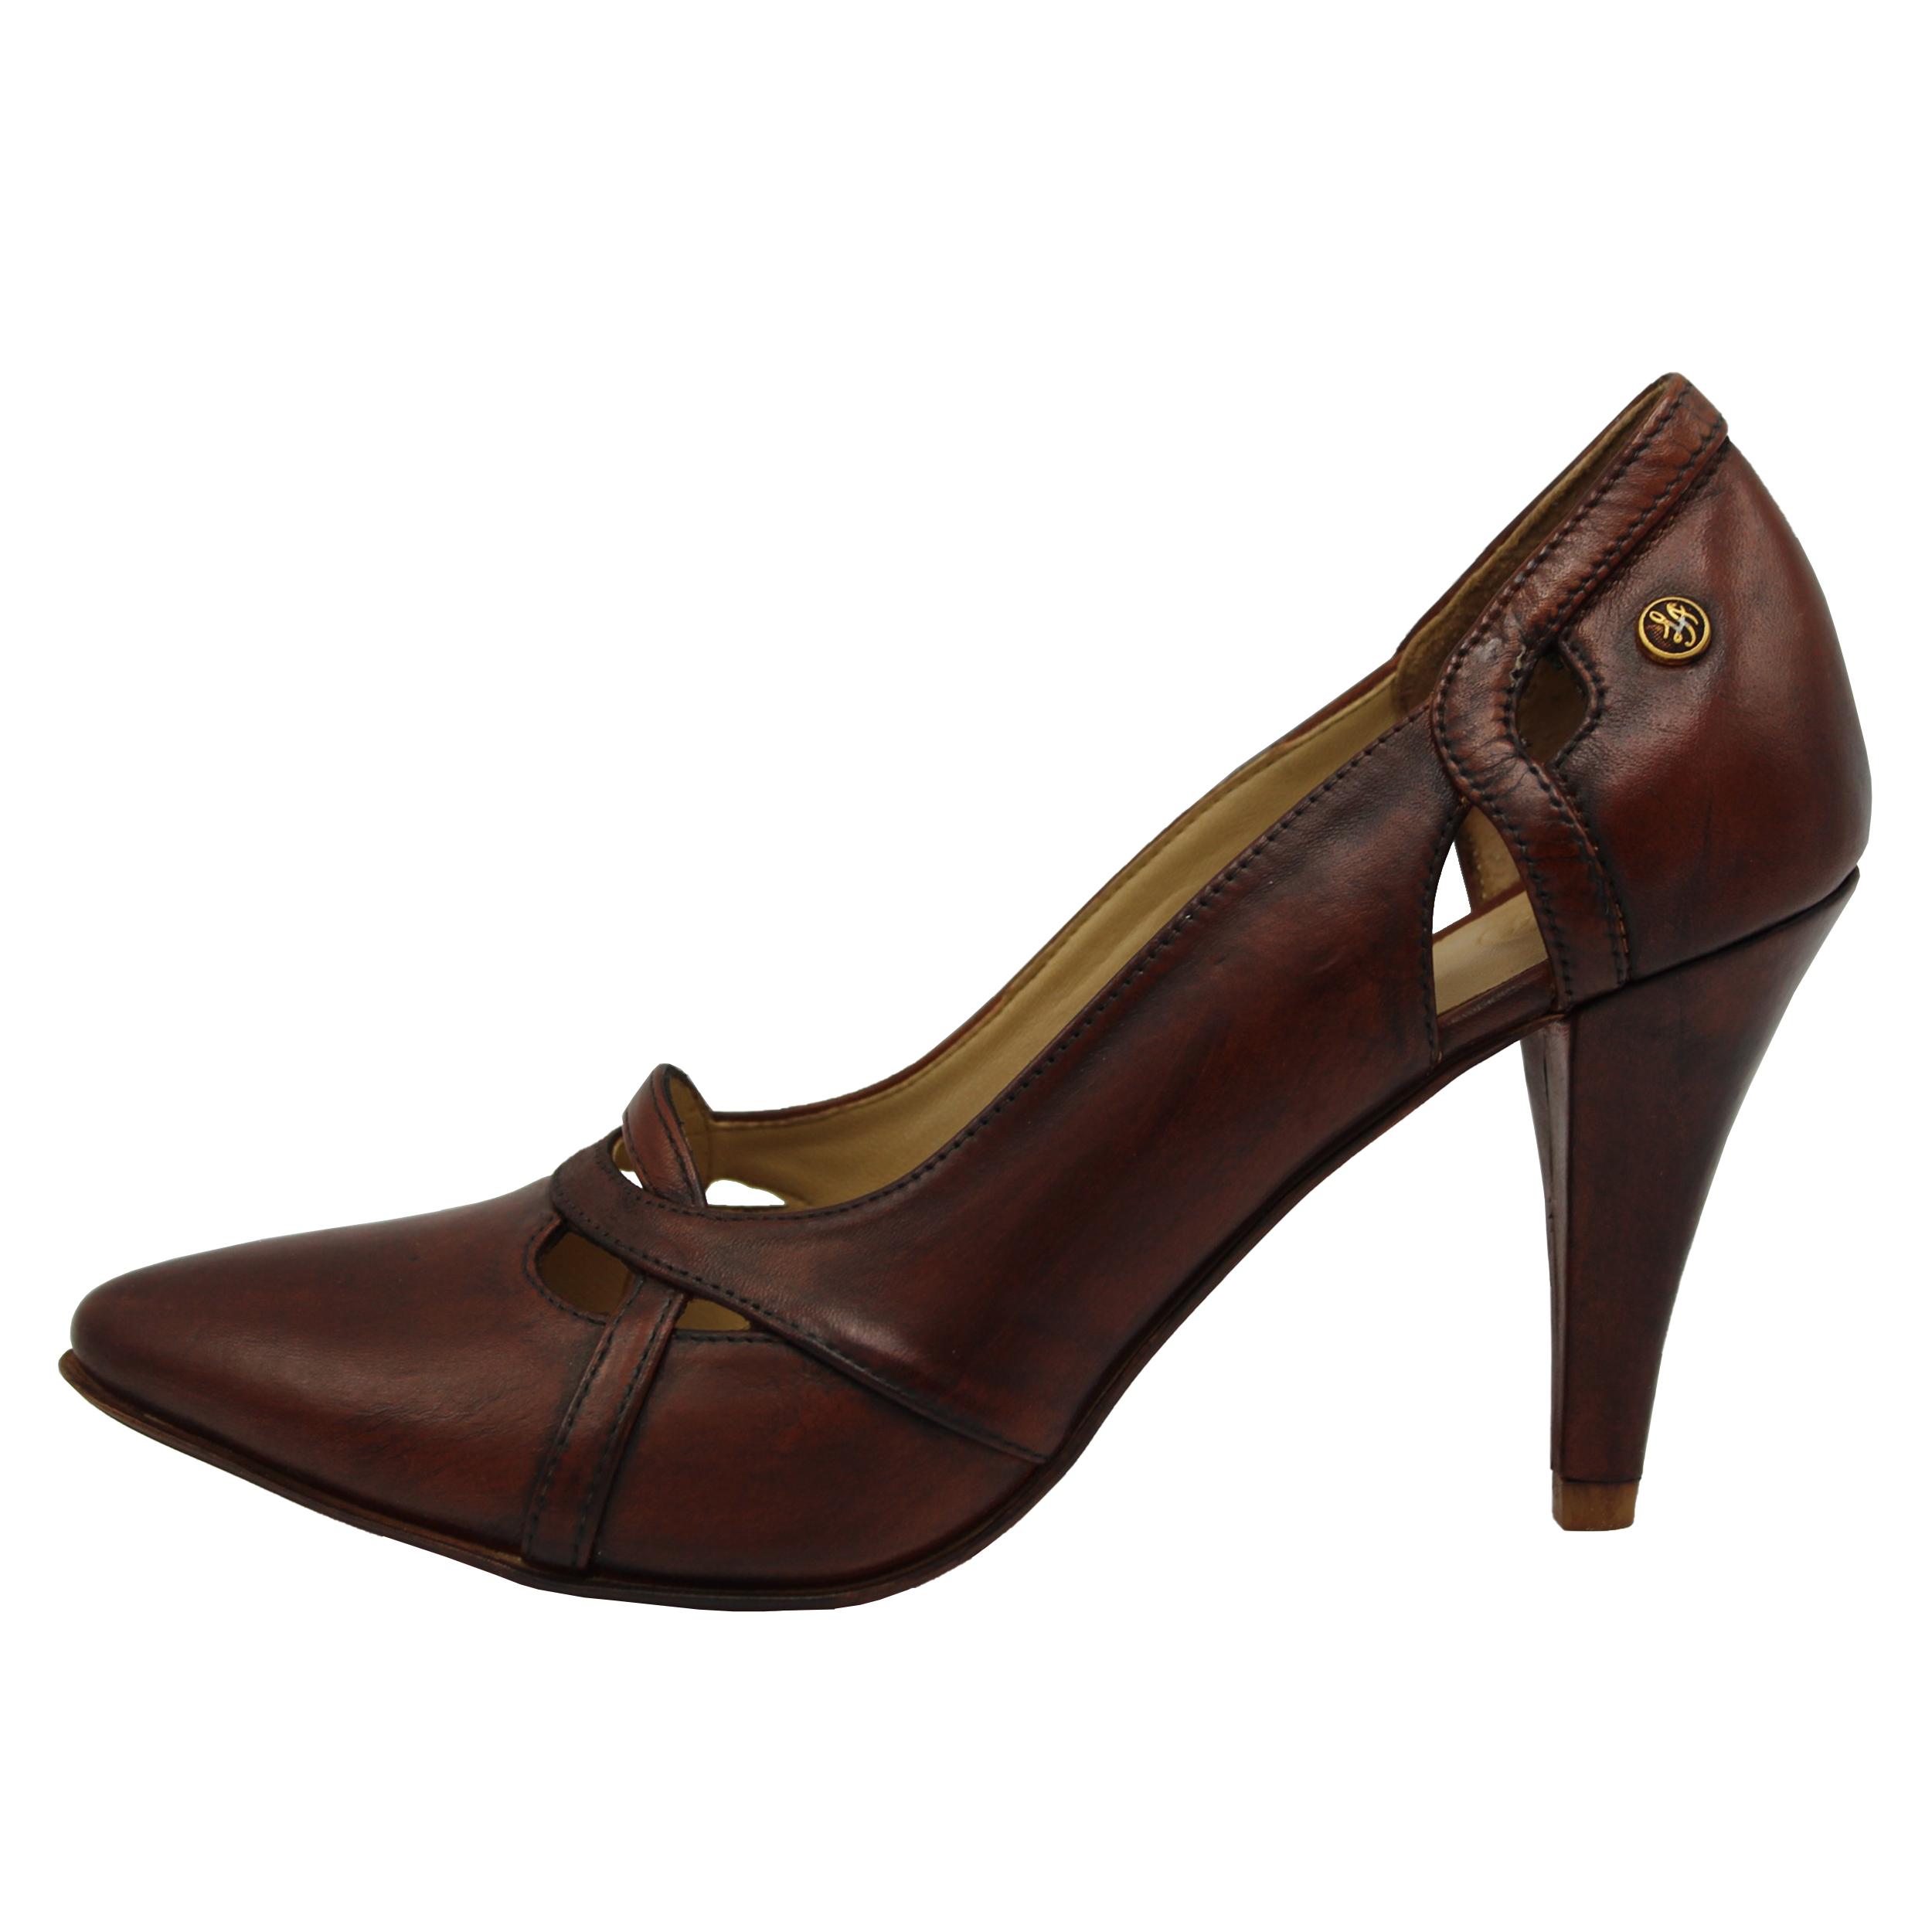 کفش زنانه لیانا کد 815-KA